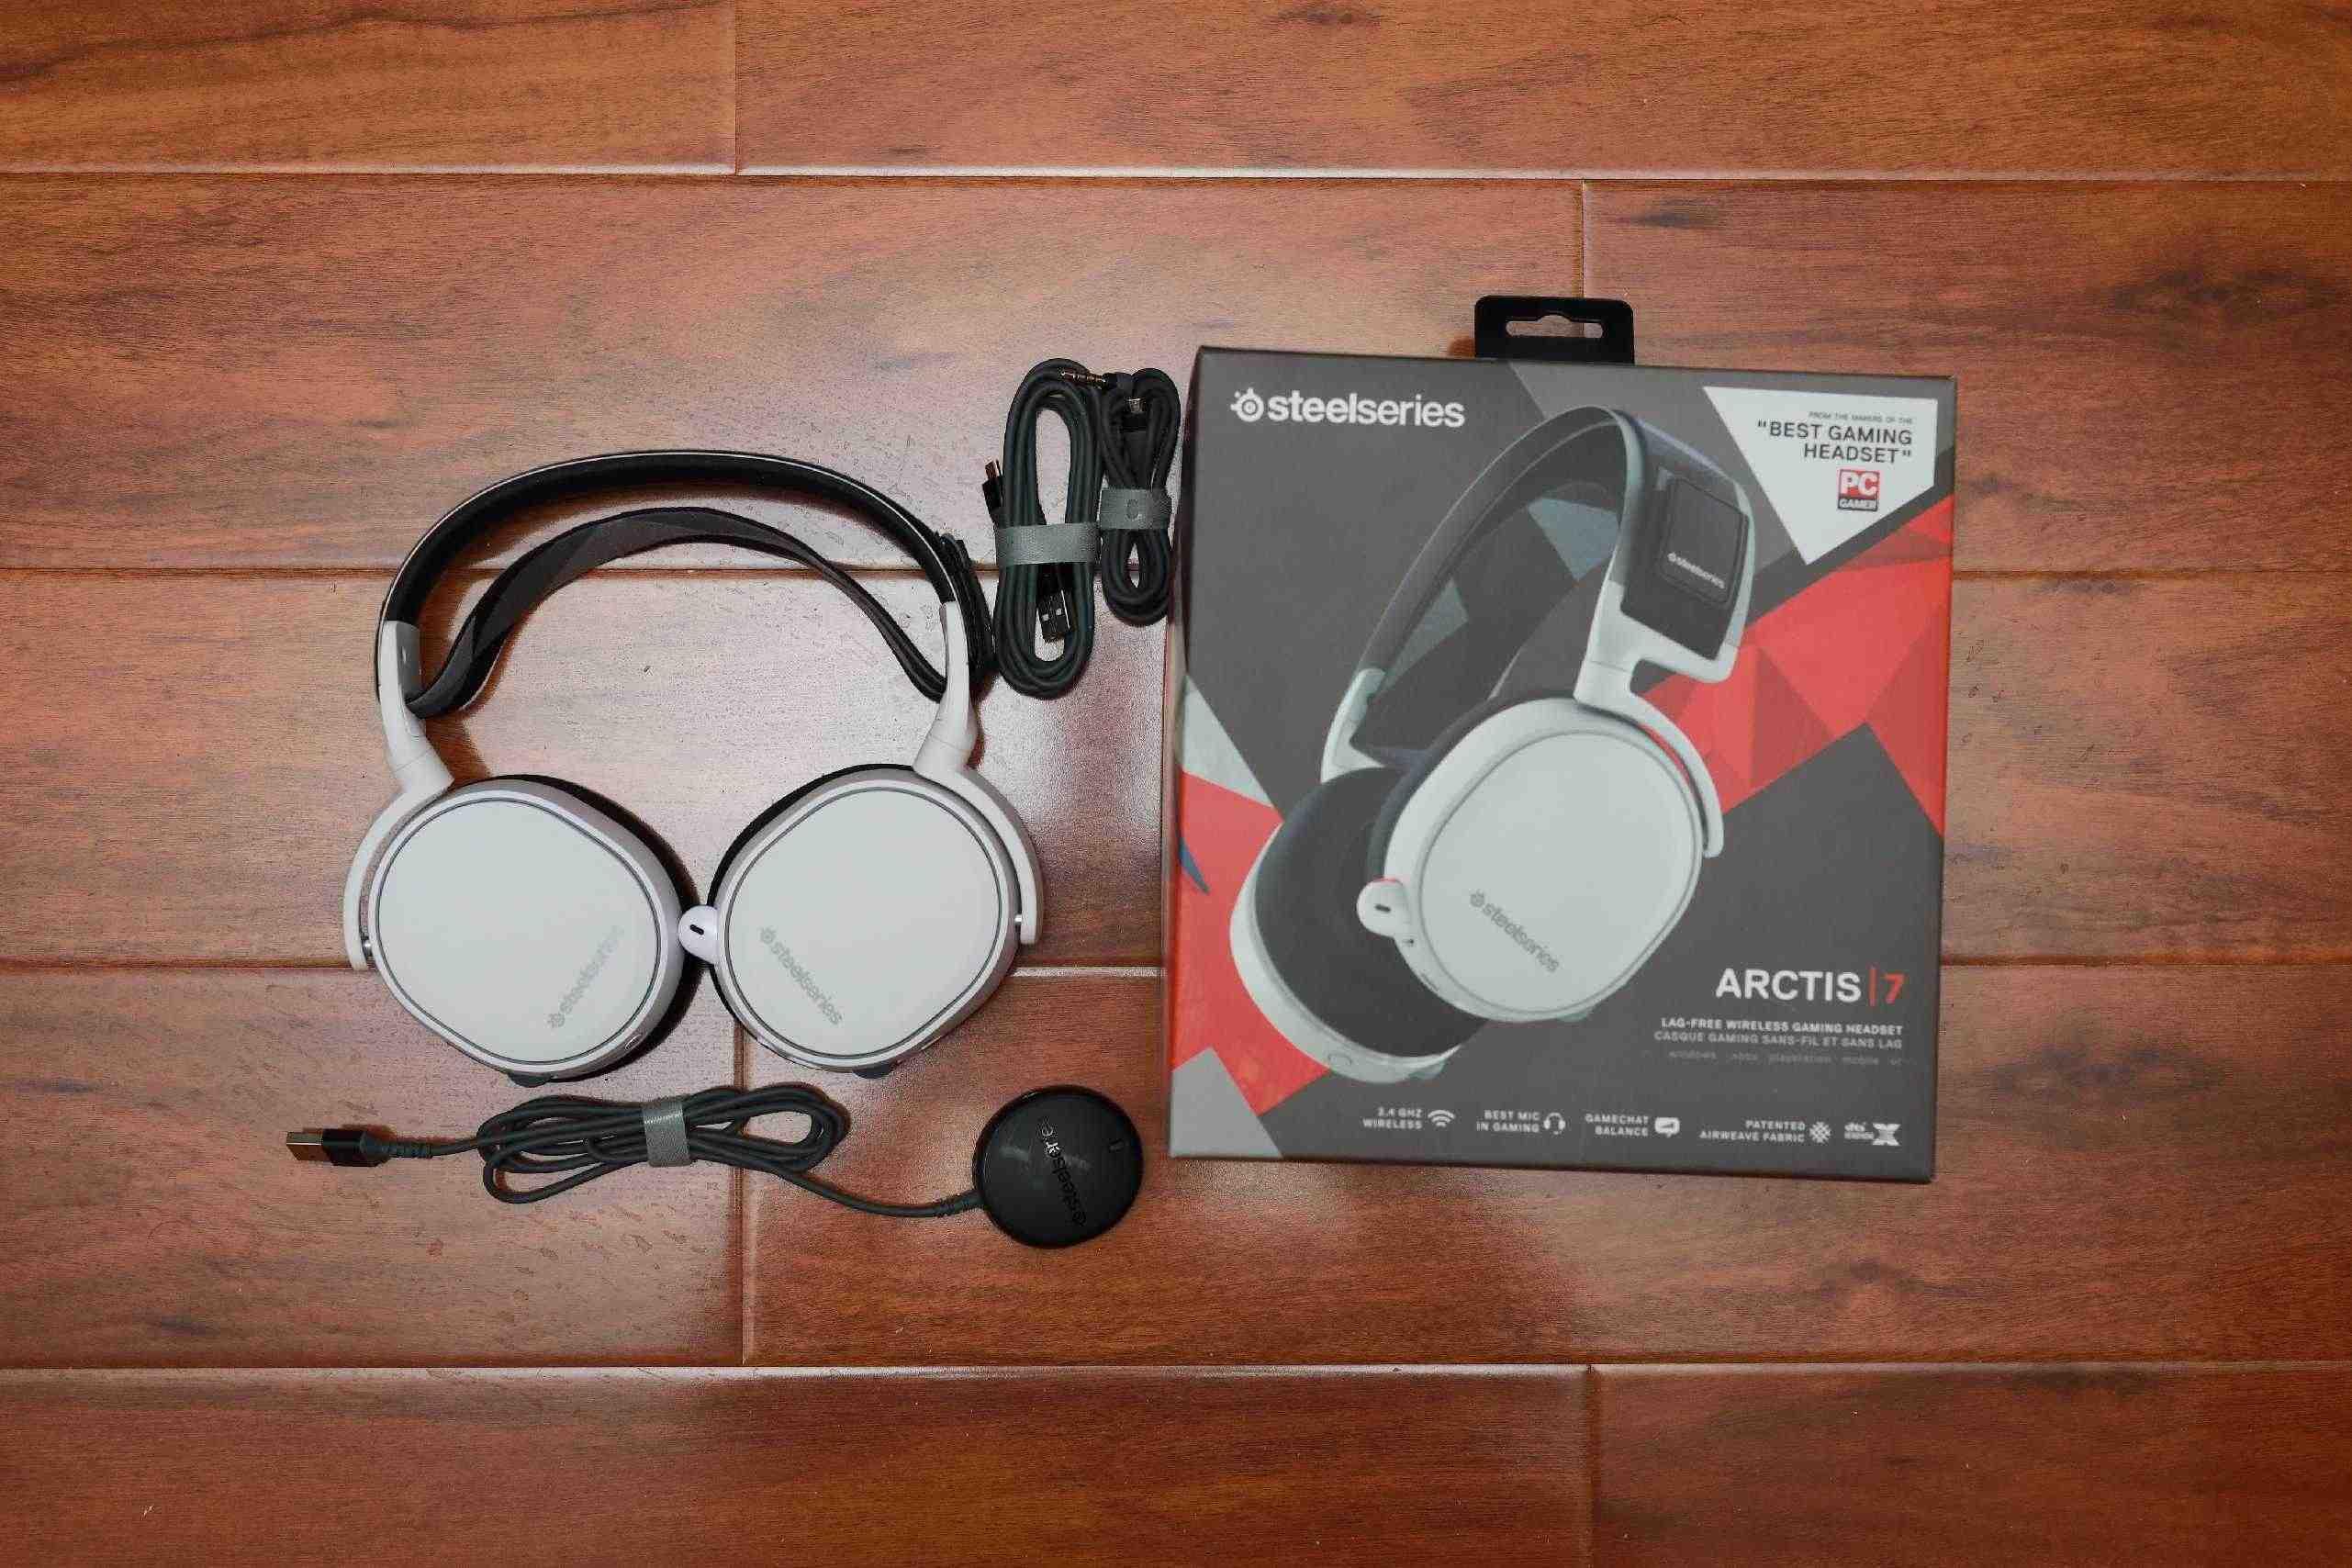 Análisis Steelseries Arctis 7 Auriculares Gaming